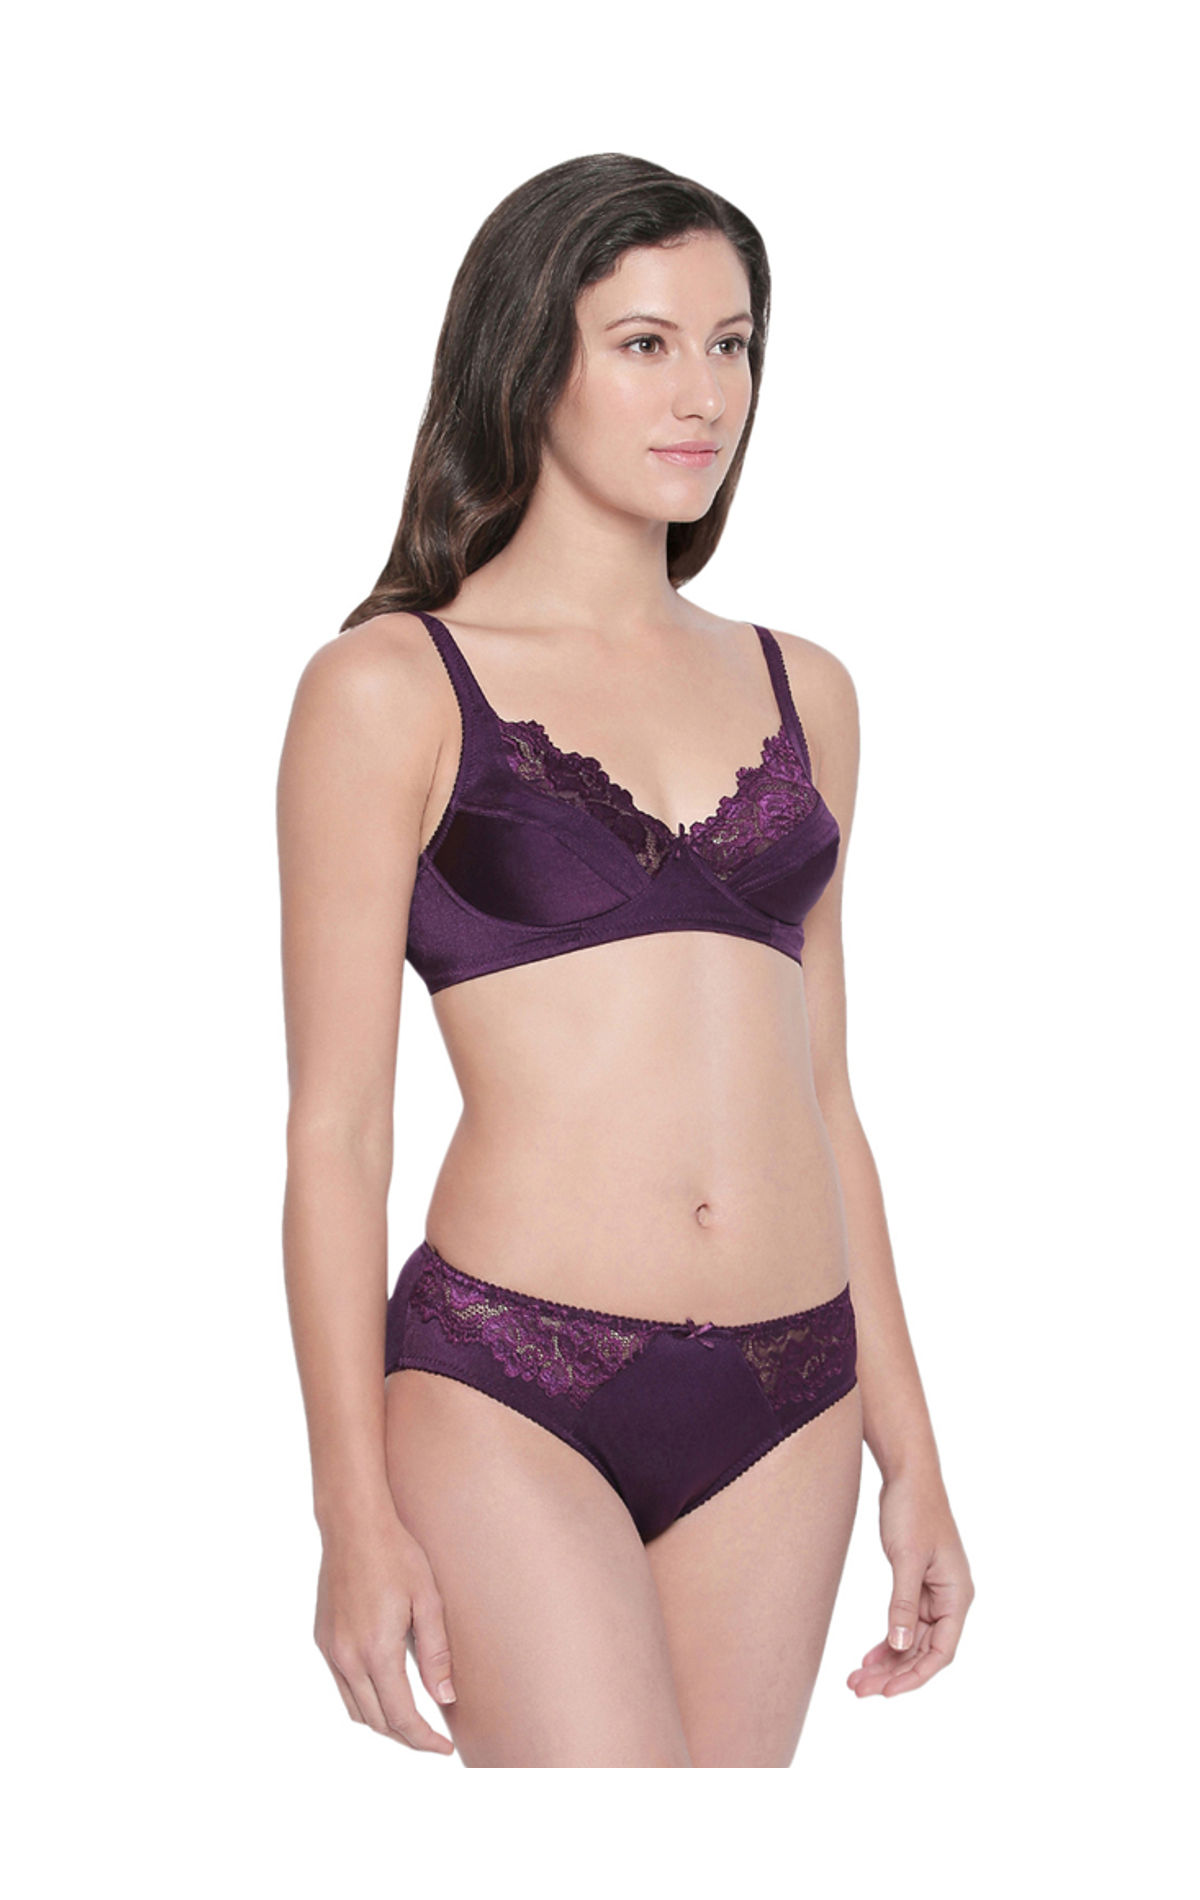 684d08326f2 ... BODYCARE Bridal Dark Purple Bra   Panty Lingerie Set - 6409DPU